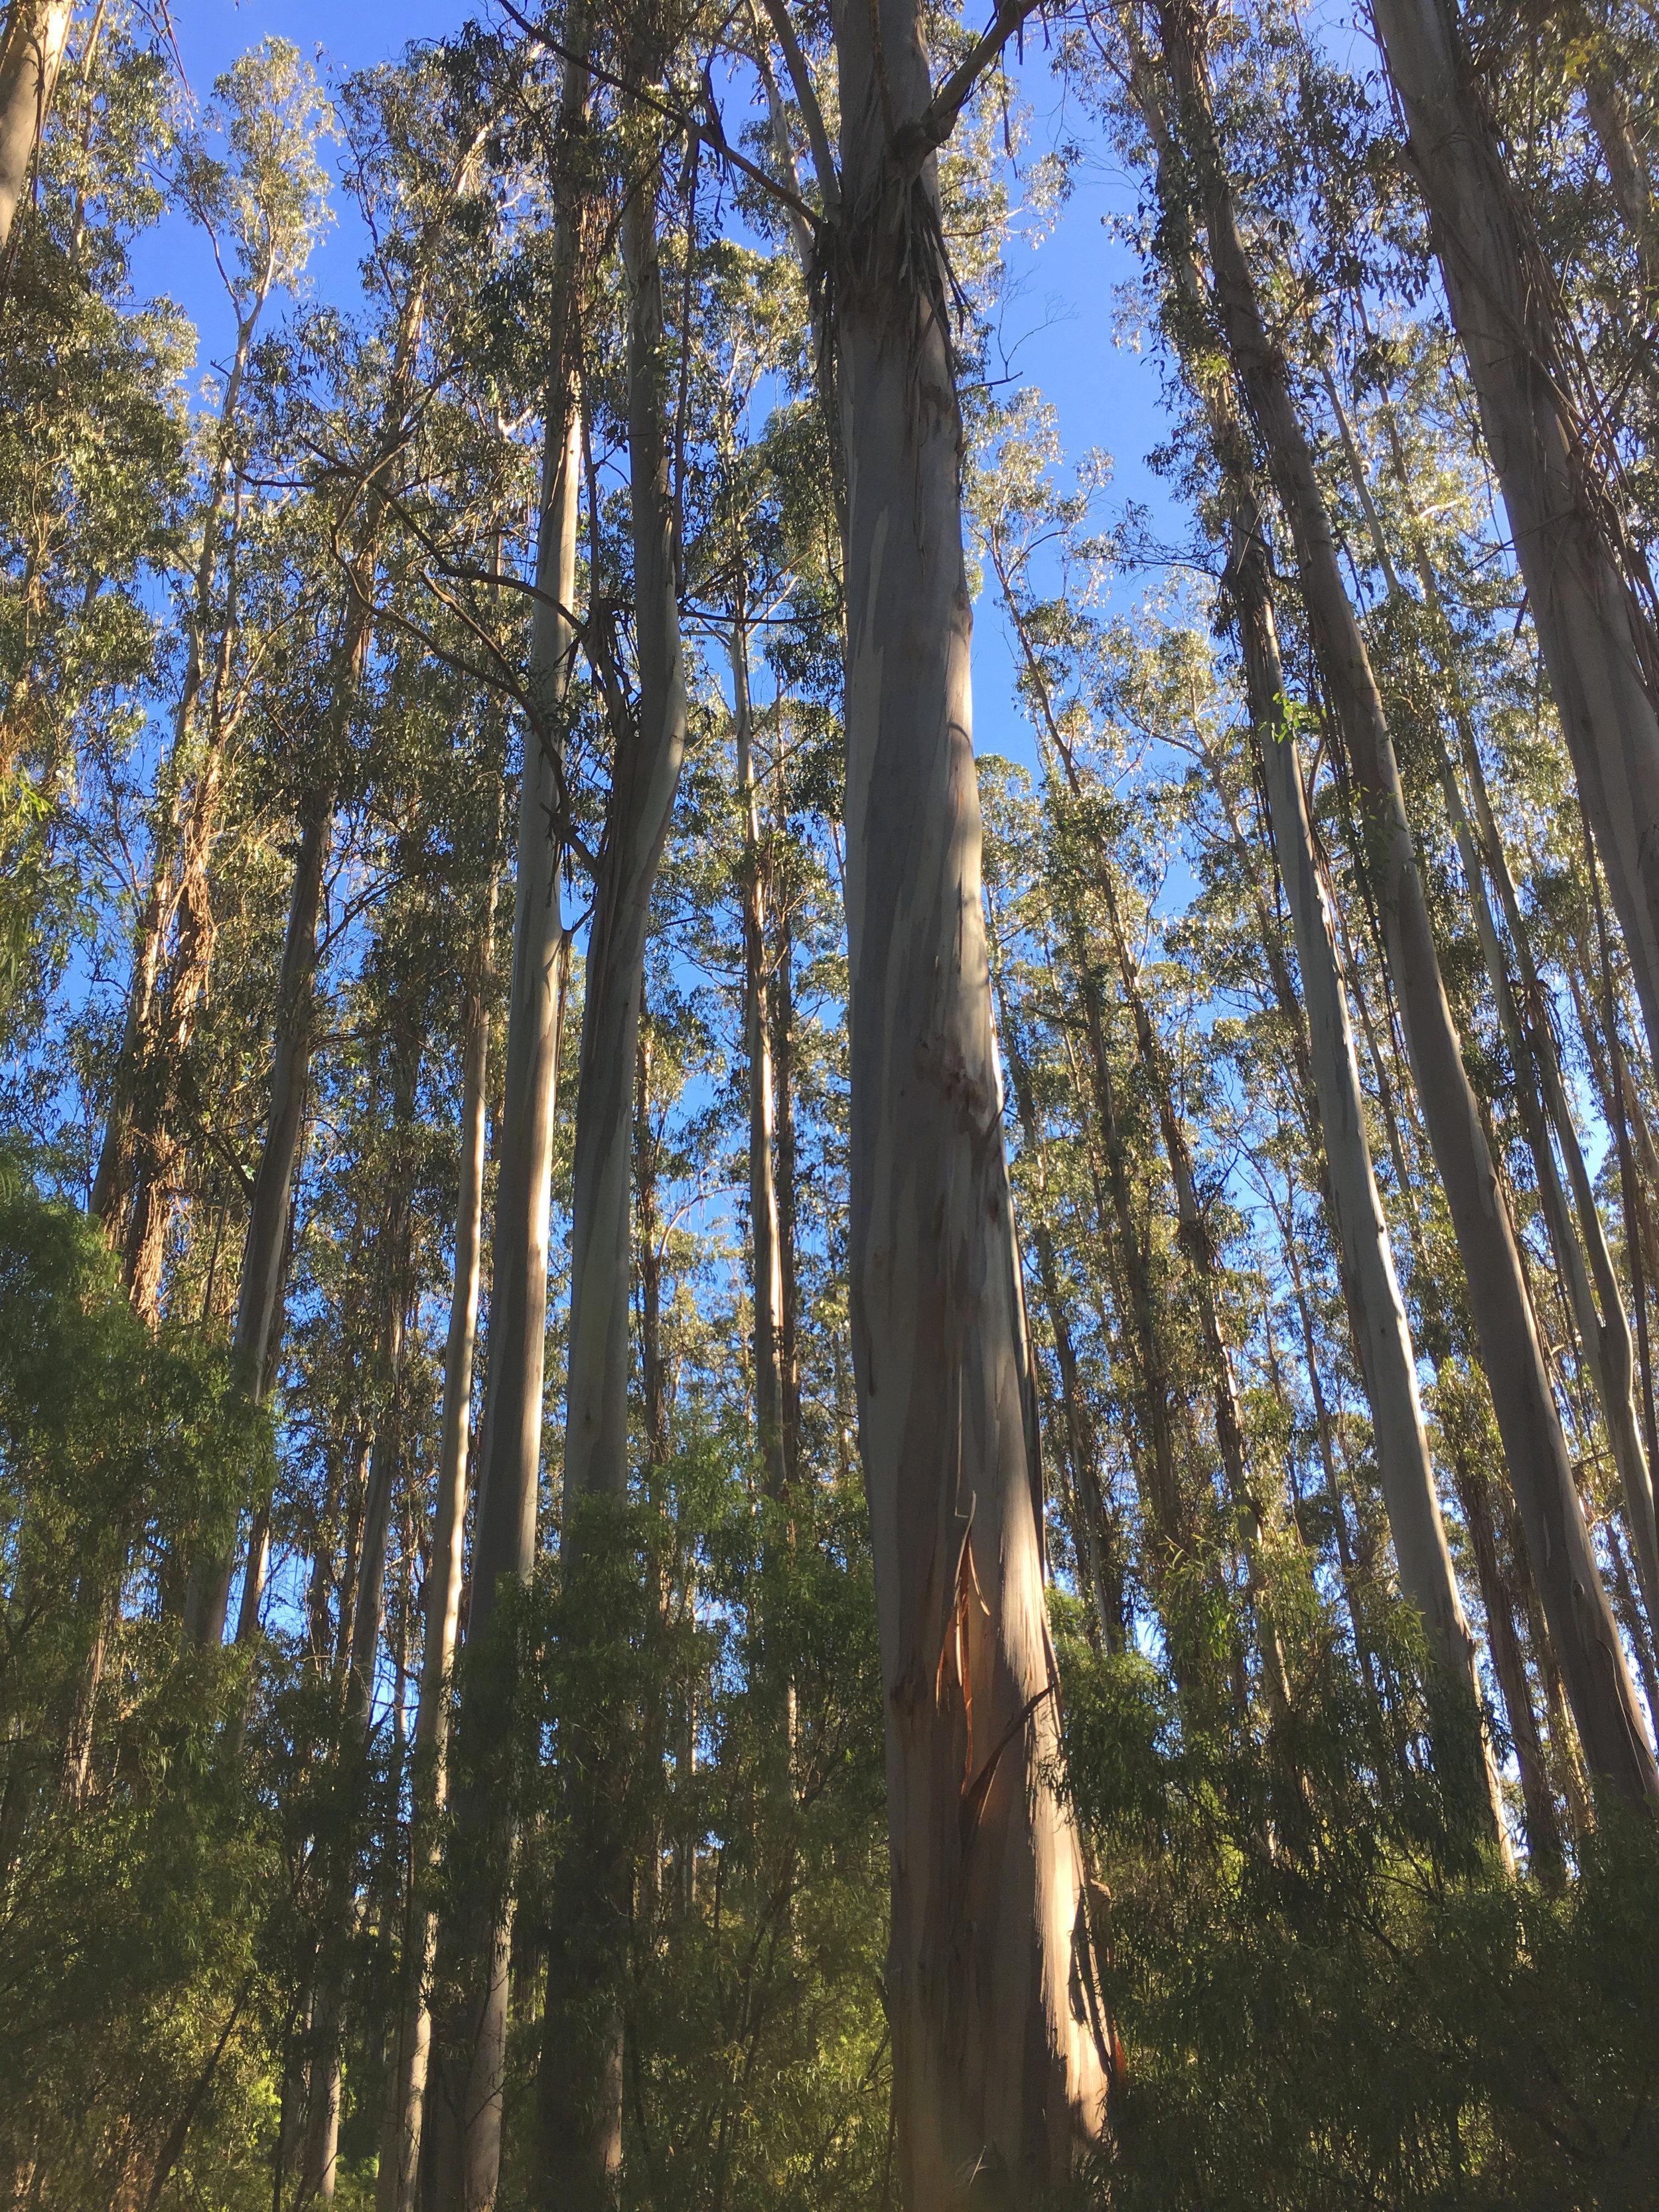 Karri trees (Eucalyptus diversicolor) in the Boranup Forest, near Margaret River, Western Australia, (photograph J. Cook)